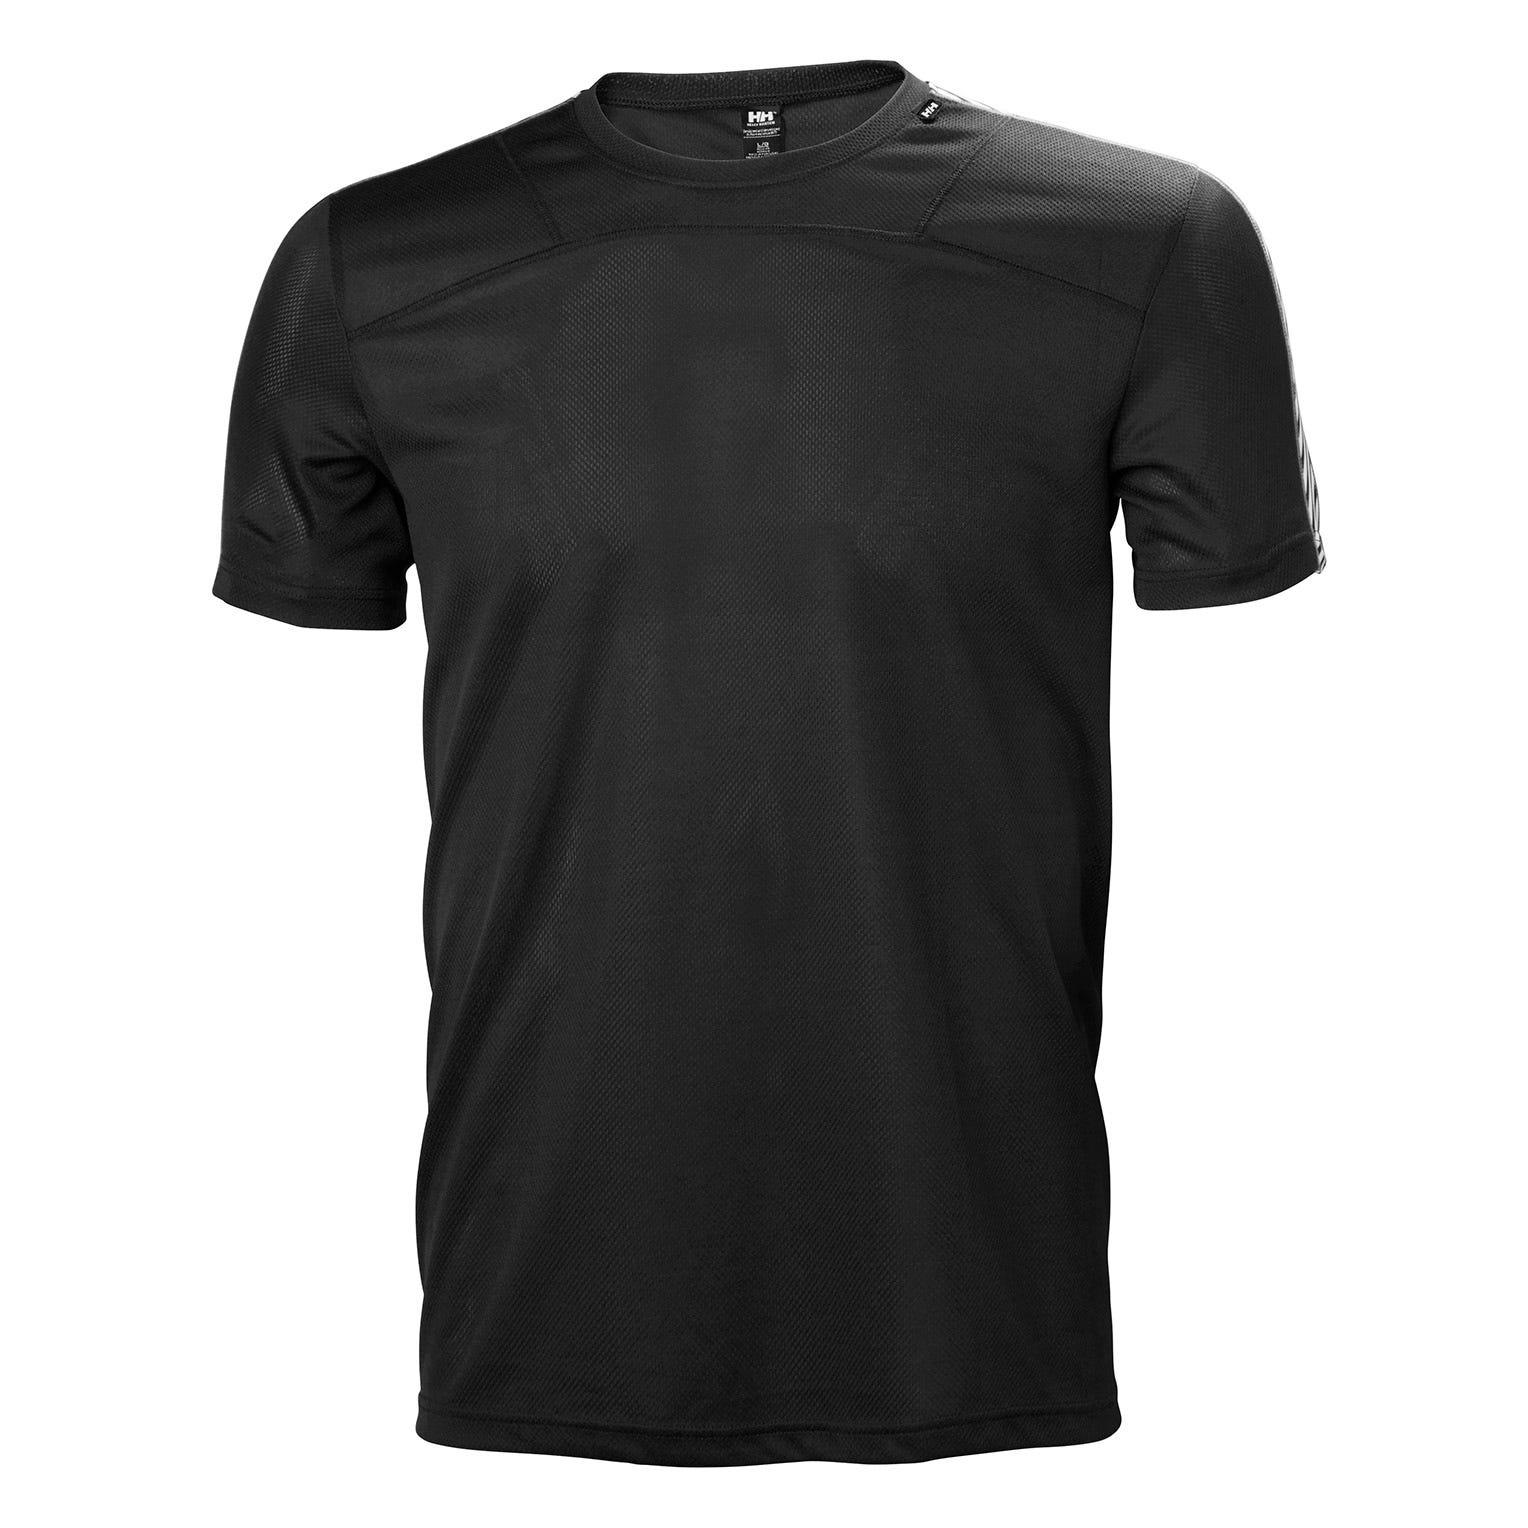 Helly Hansen Mens Lifa Tshirt Baselayer Black XL